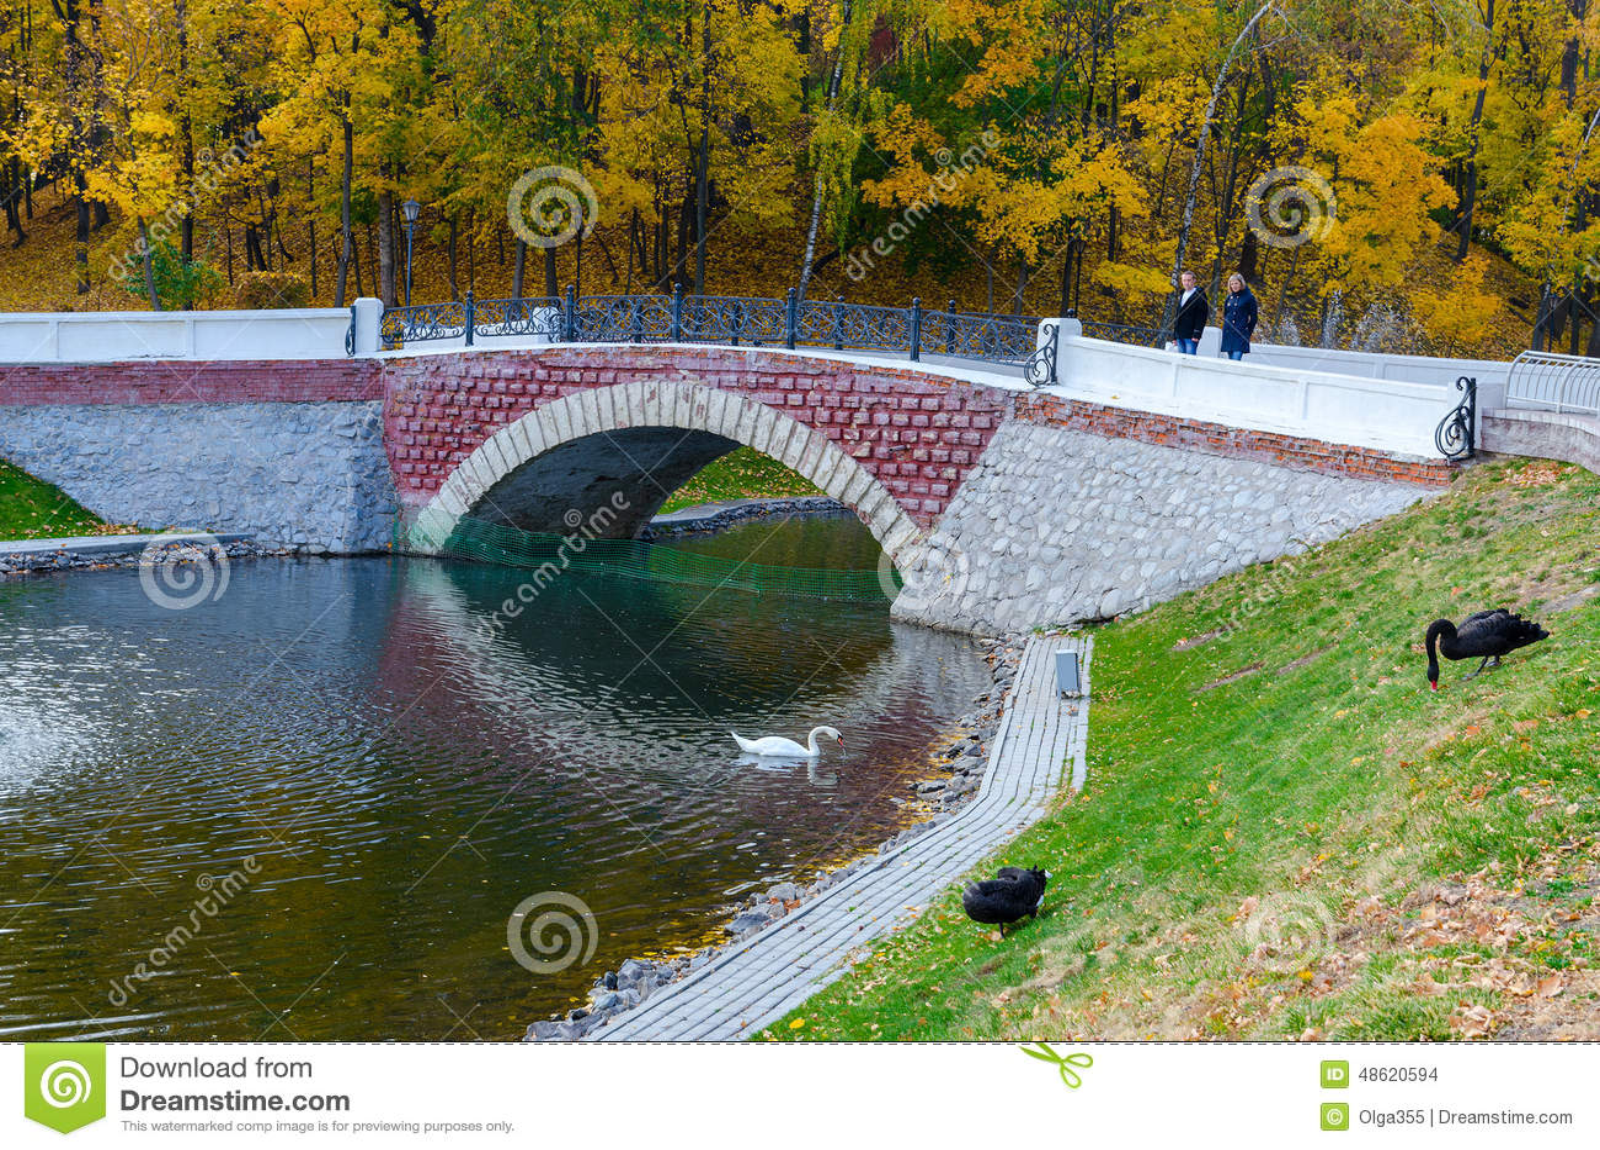 Belarus, Gomel, the Swan Pond in the autumn park